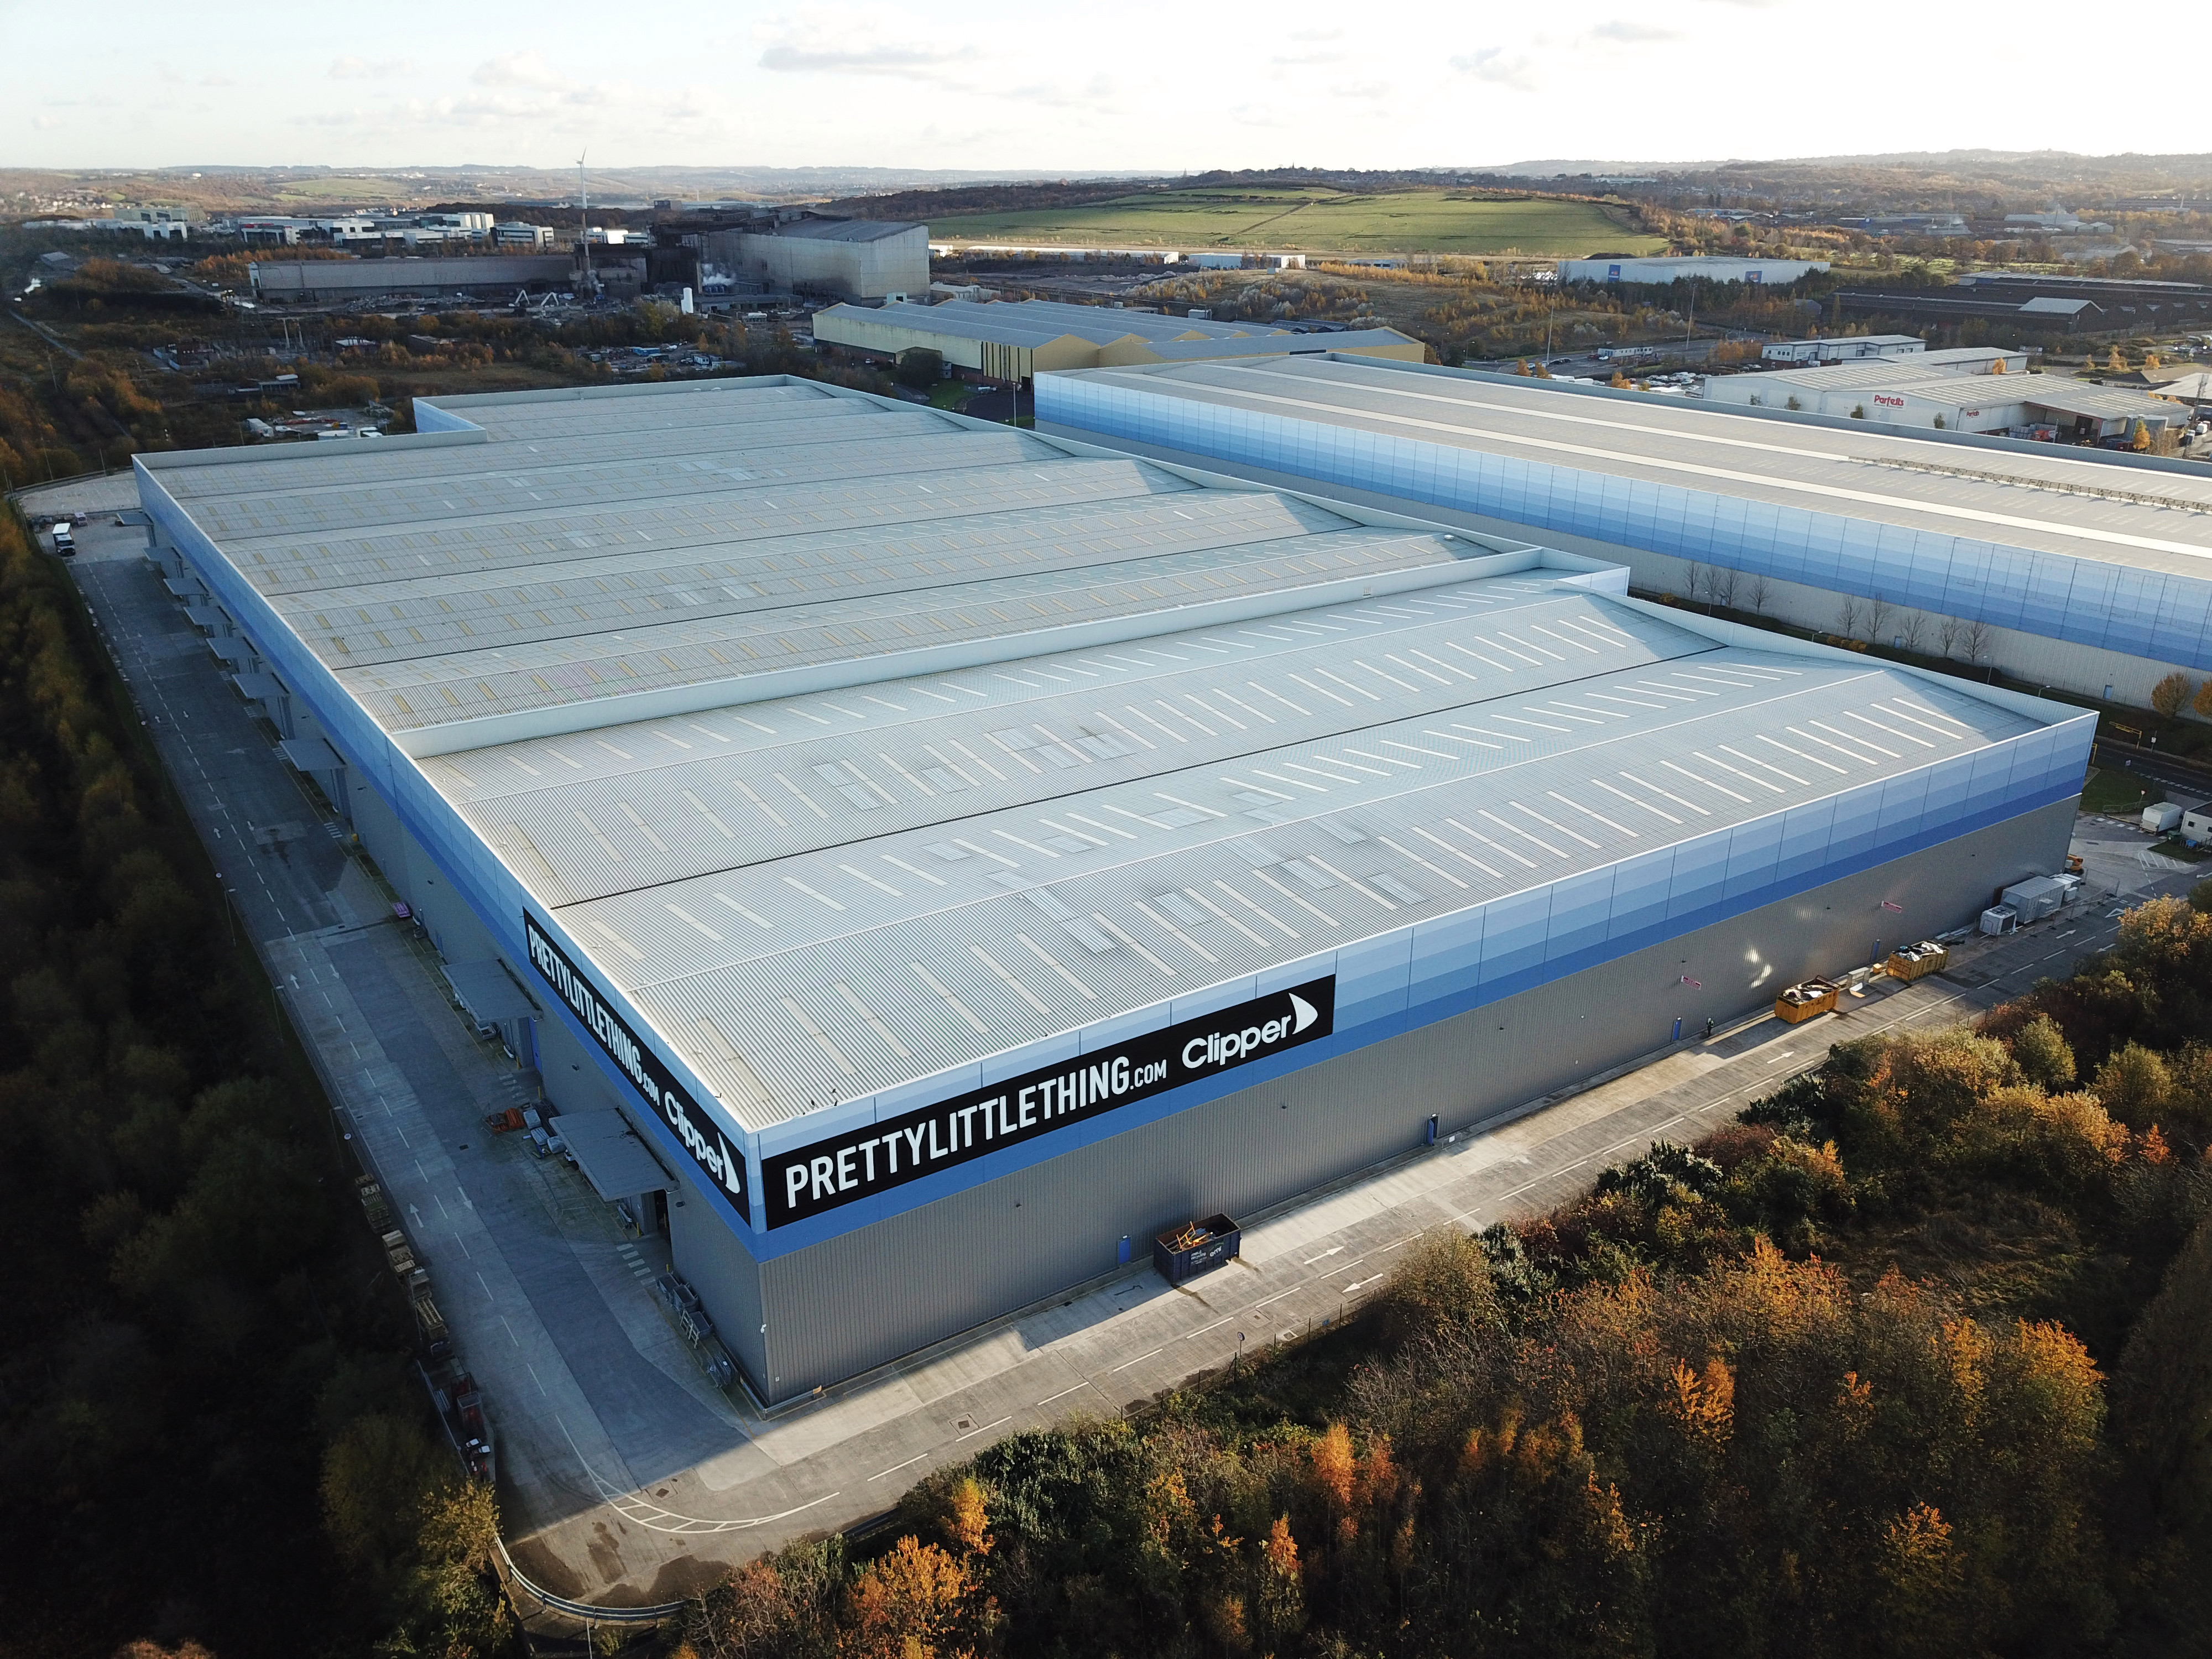 The PrettyLittleThing mega-warehouse